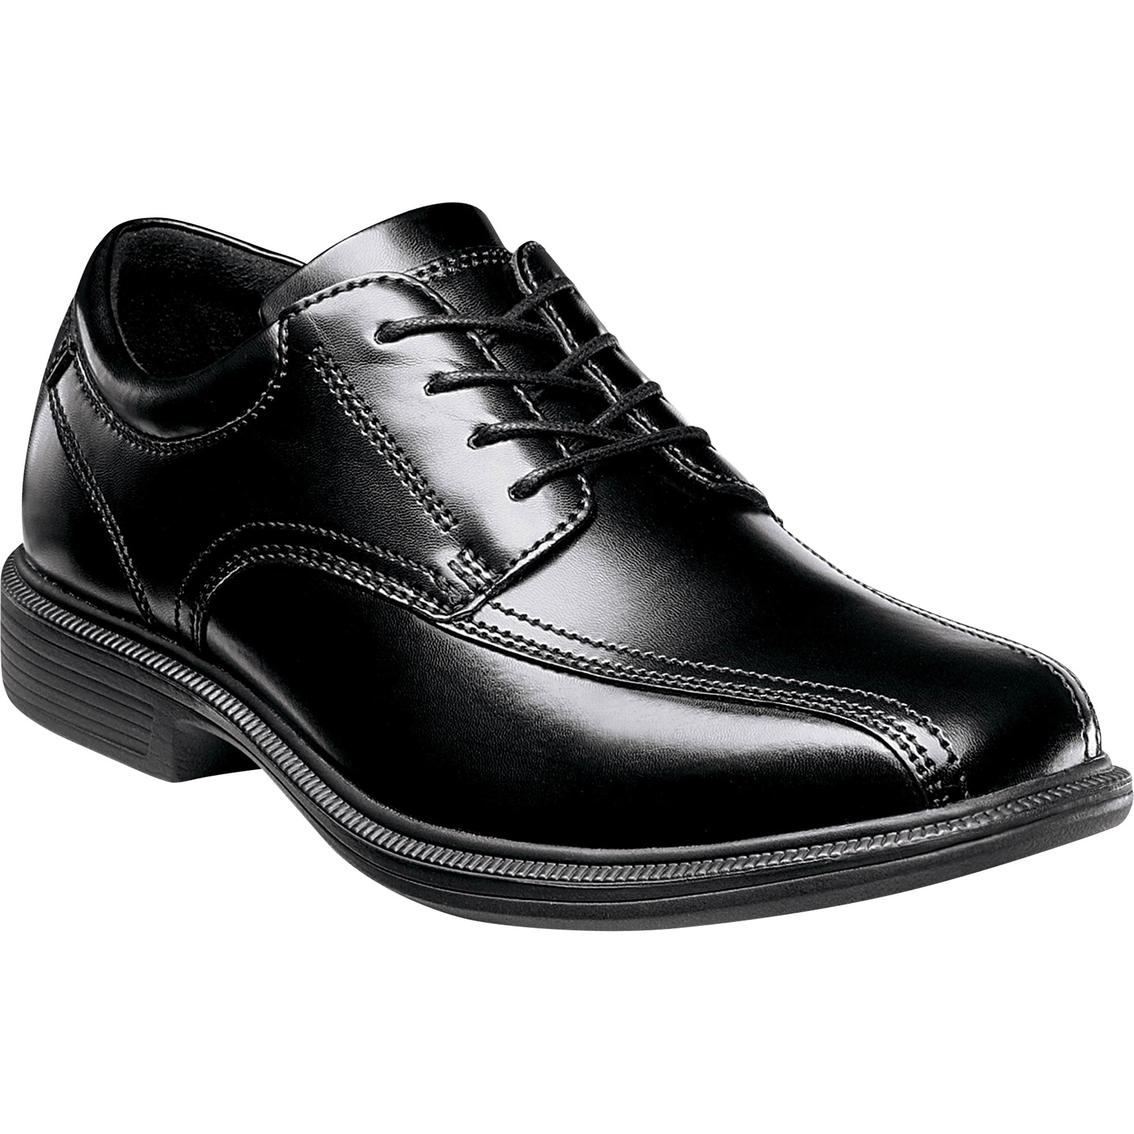 86300d8bc37d Nunn Bush Bartole Street Bicycle Top Oxford Shoes